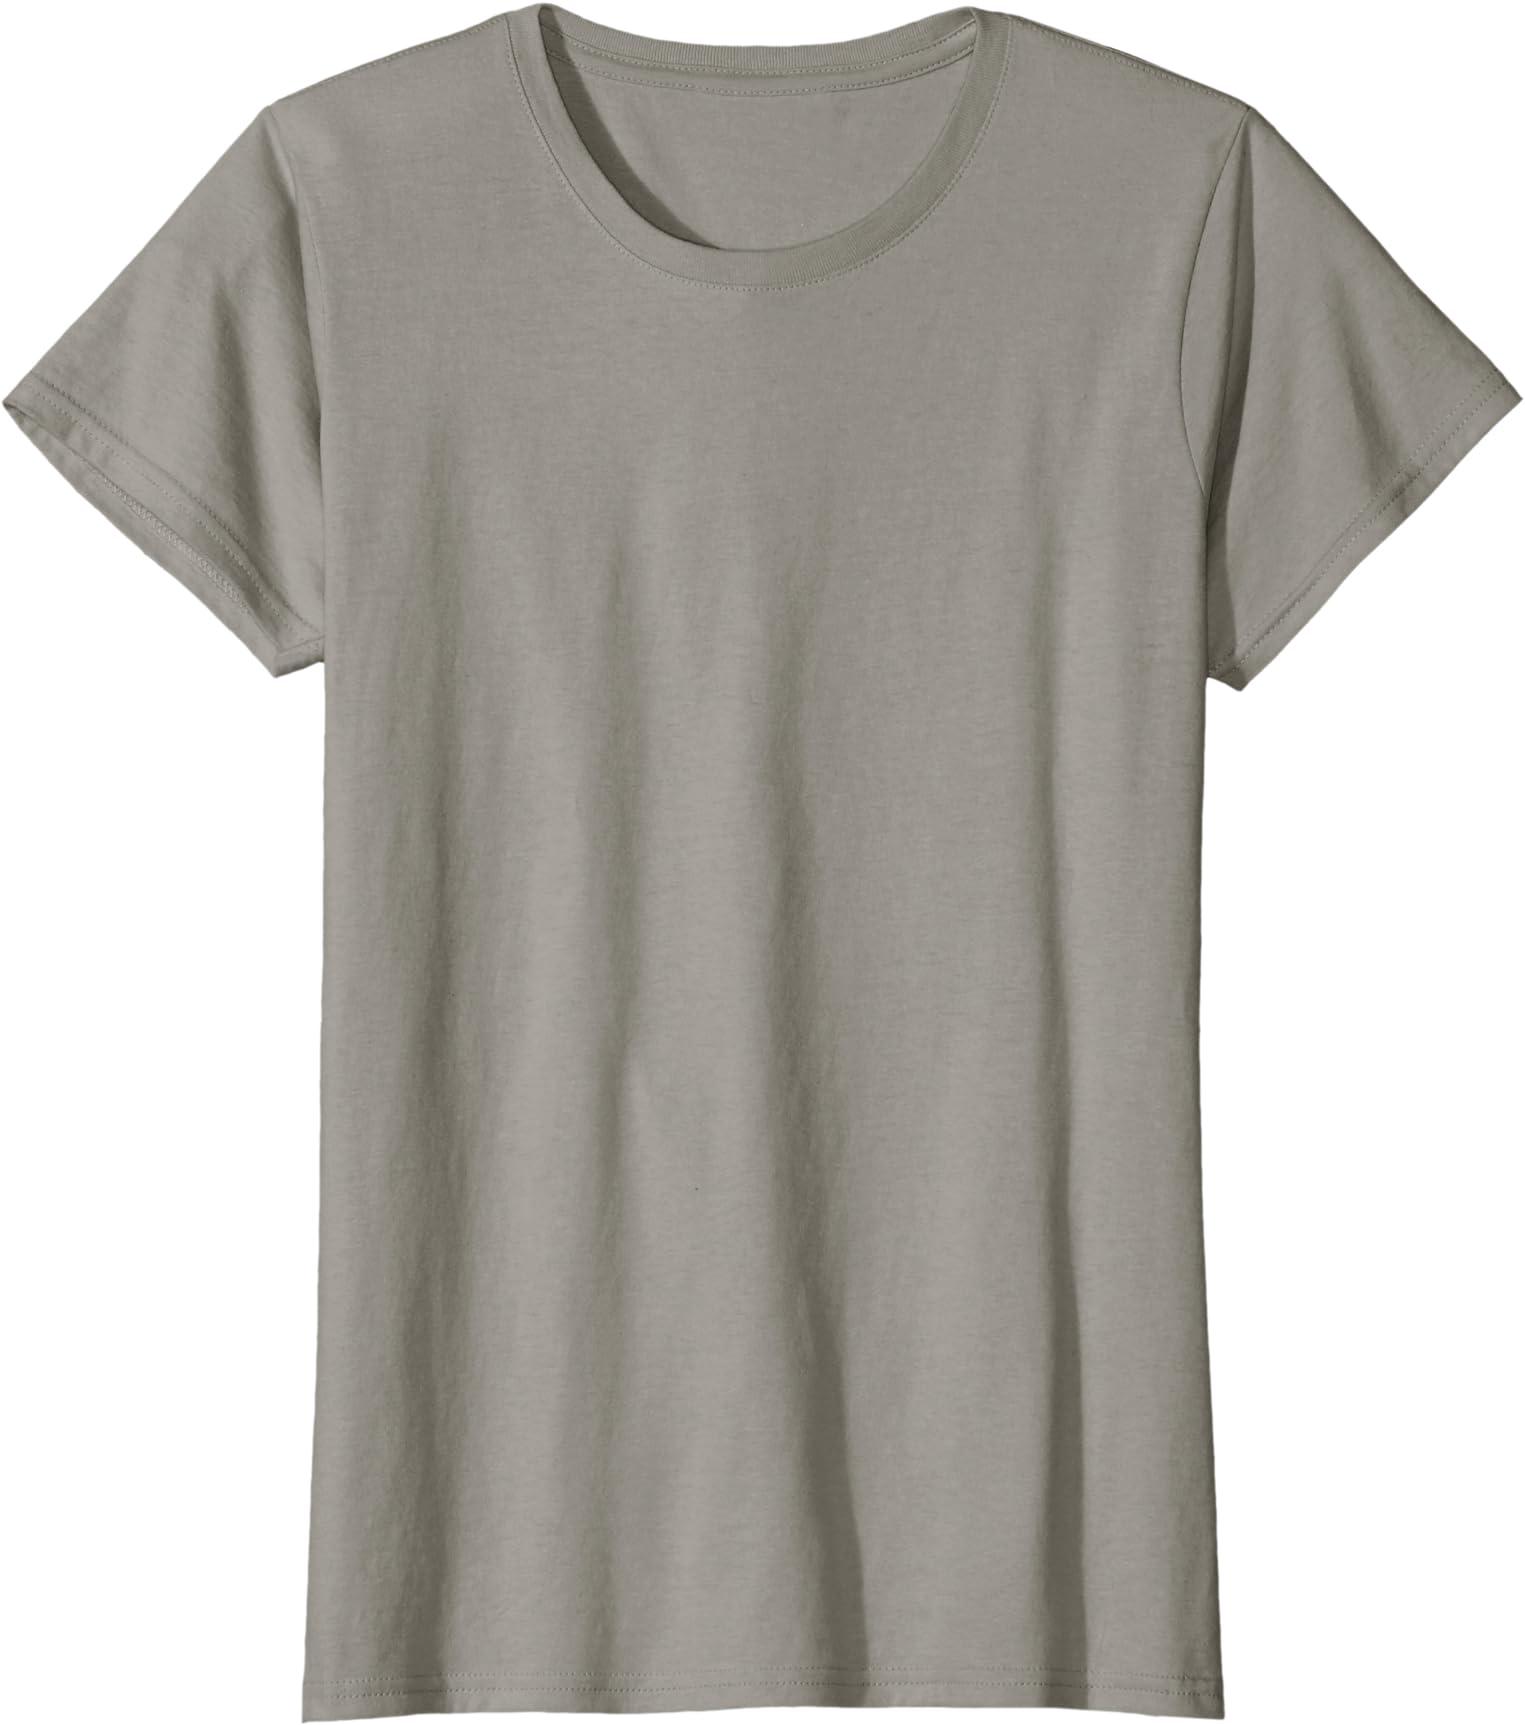 Long Sleeve Shirt Light Orange Anteater Floral Pattern Tee Shirt